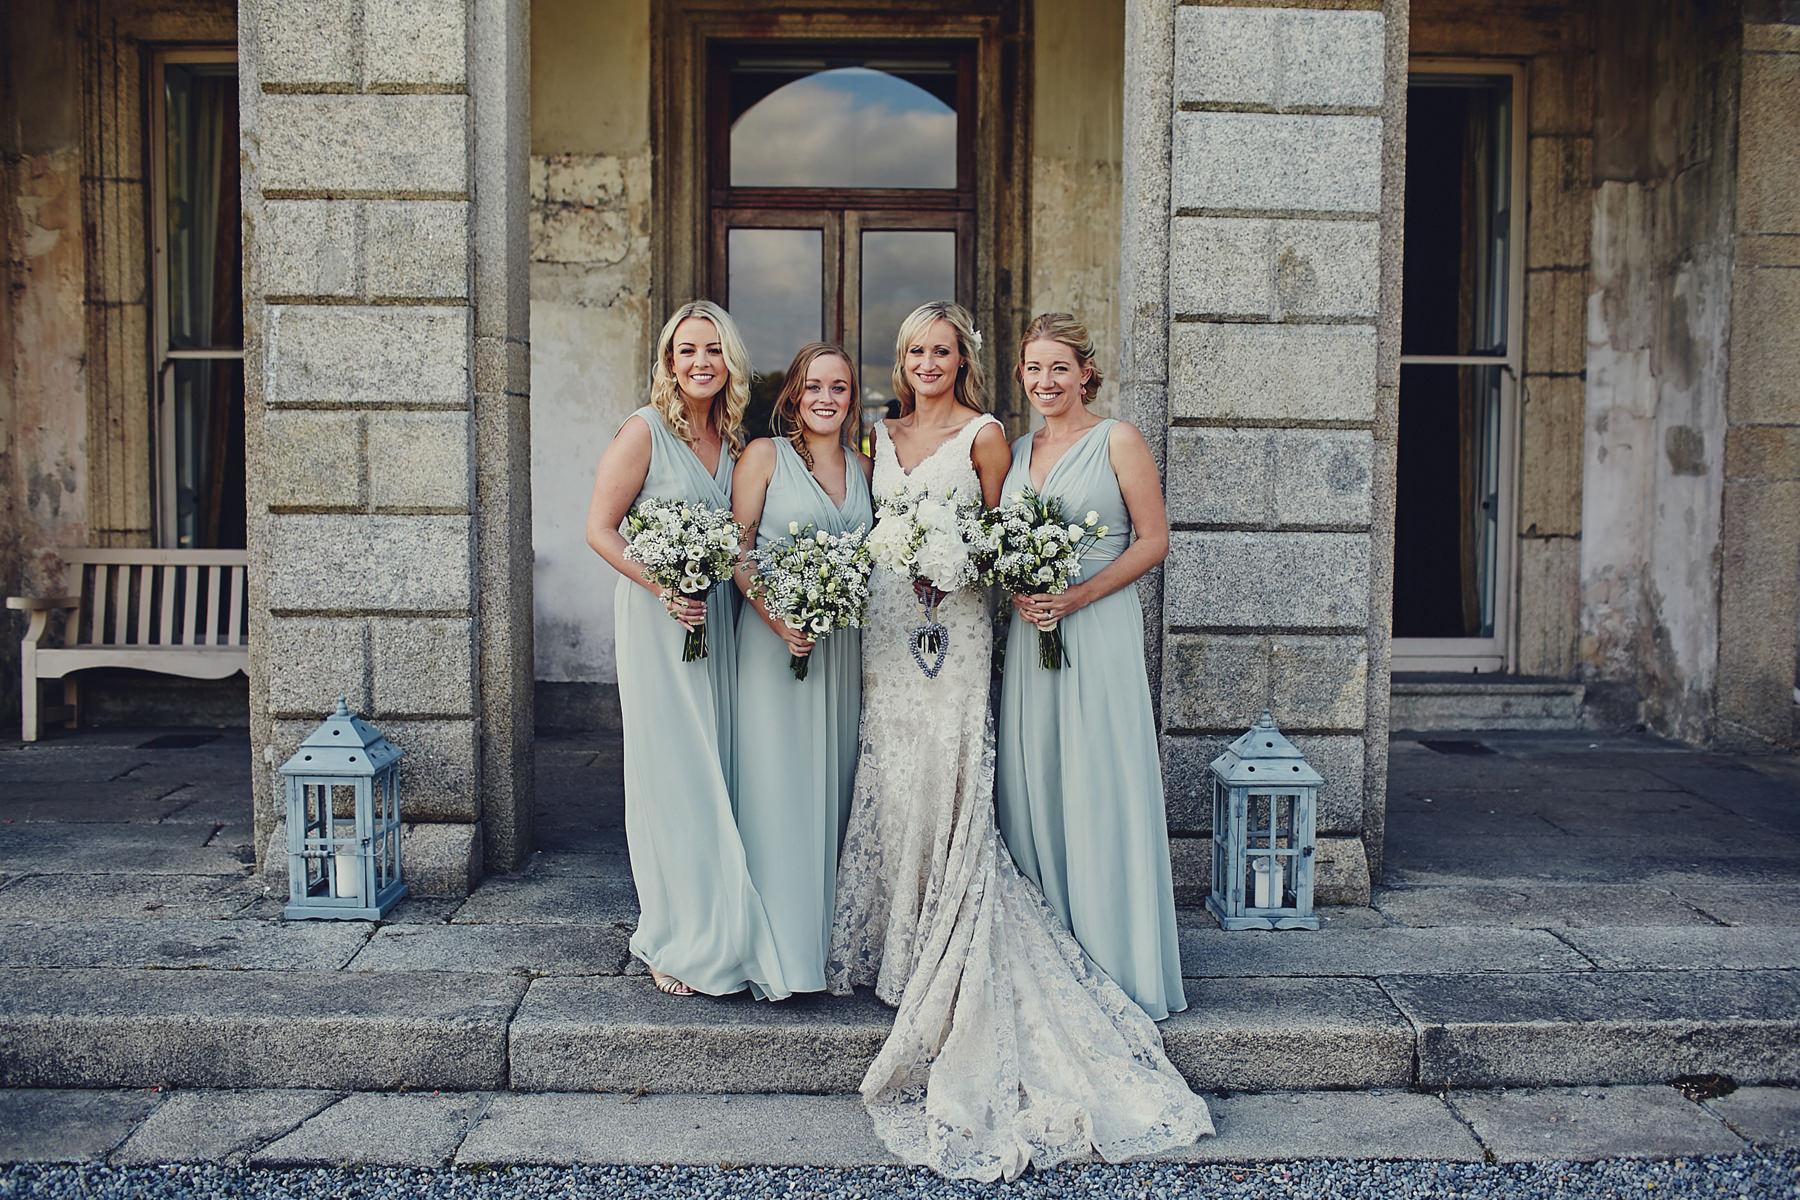 Wedding at Borris House co.Carlow 043 - Borris House wedding | Cara & David